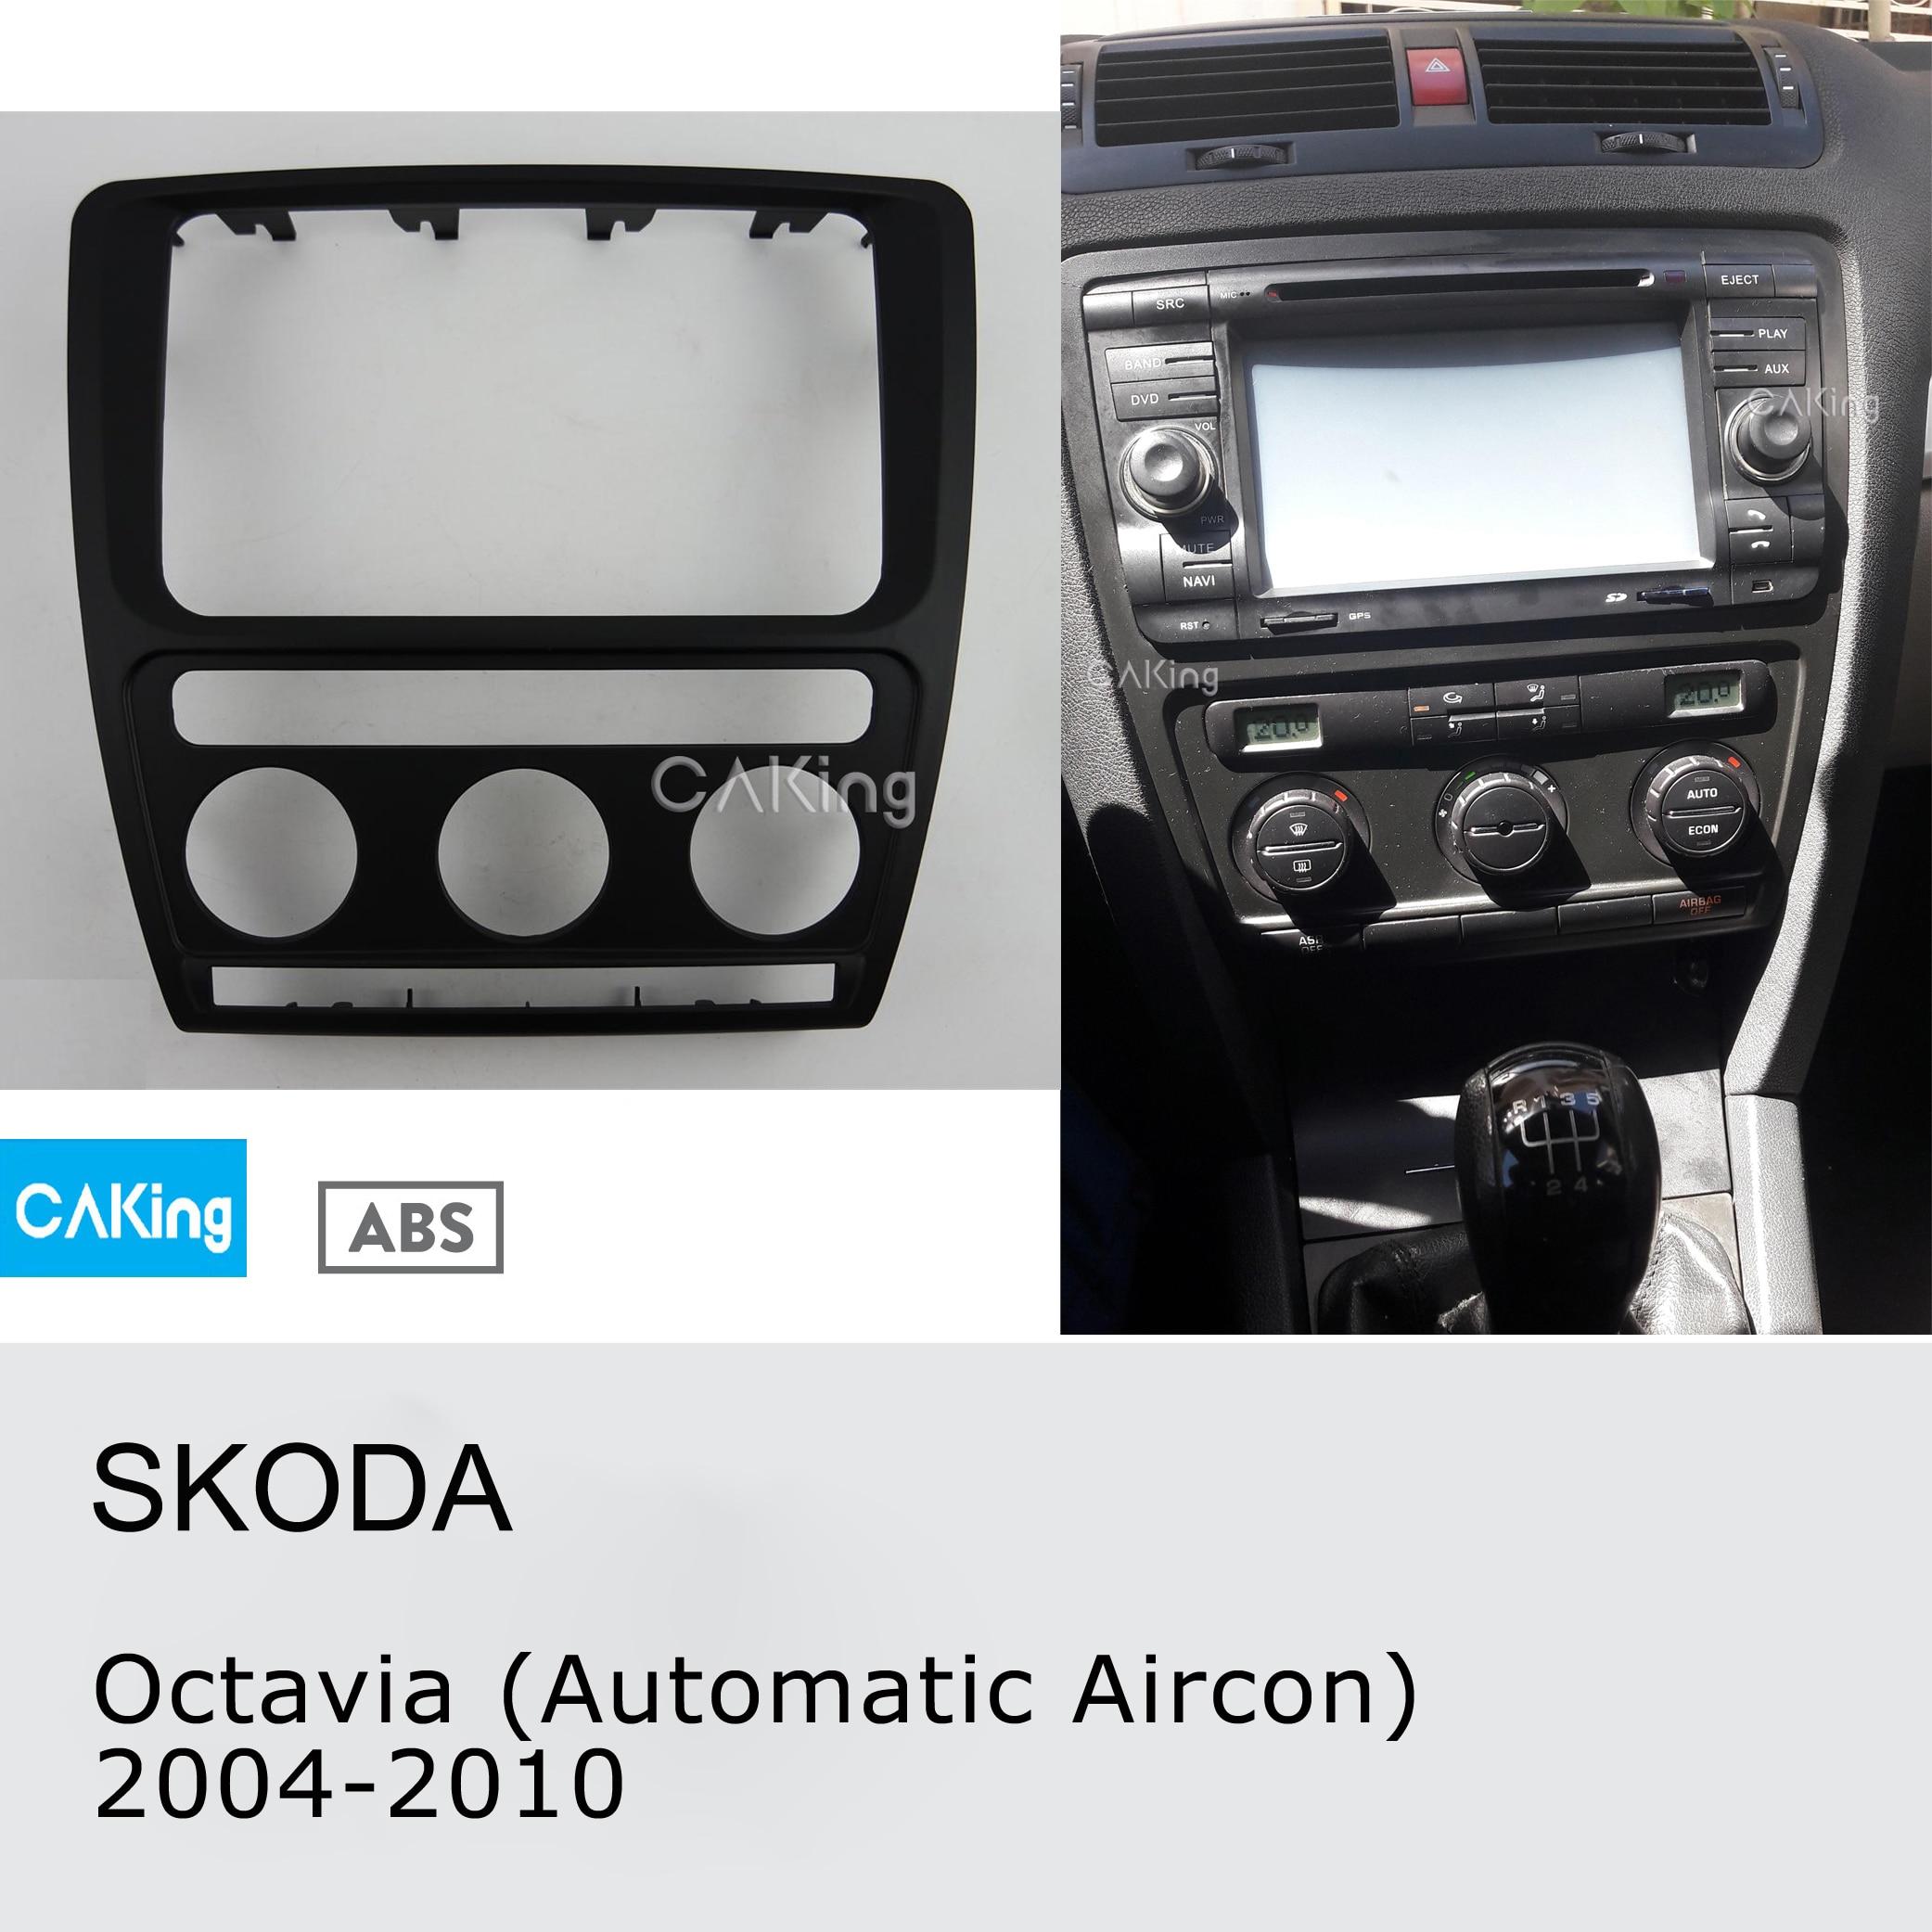 Car Radio Facia For Skoda Octavia (Automatic Aircon) 2004-2010 DVD Fascia Stereo CD Panel Dash Kit Trim Face Plate Frame Bezel